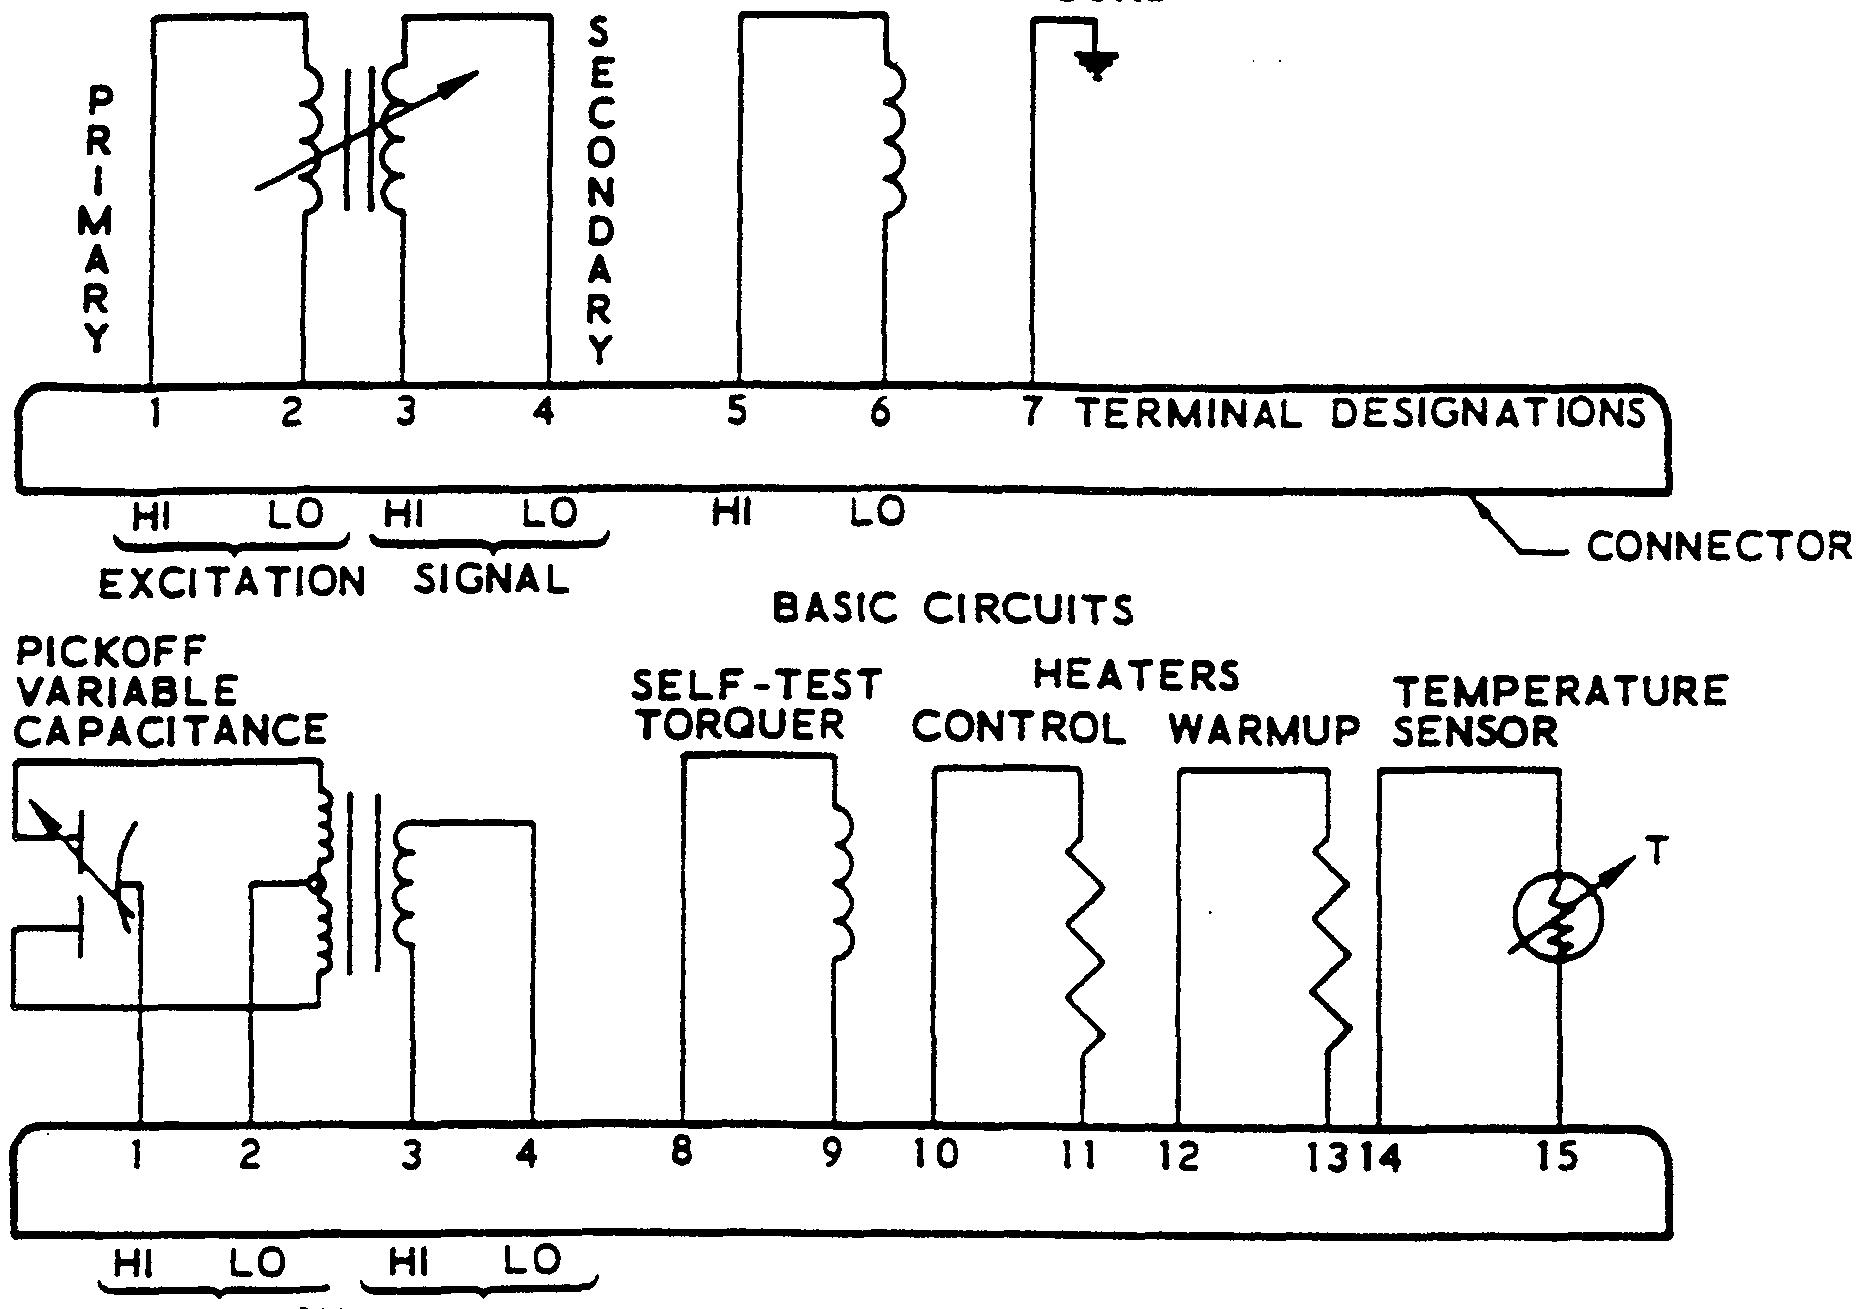 Trailer Plug Wiring Diagram In Addition Lance C Er Wiring Diagram